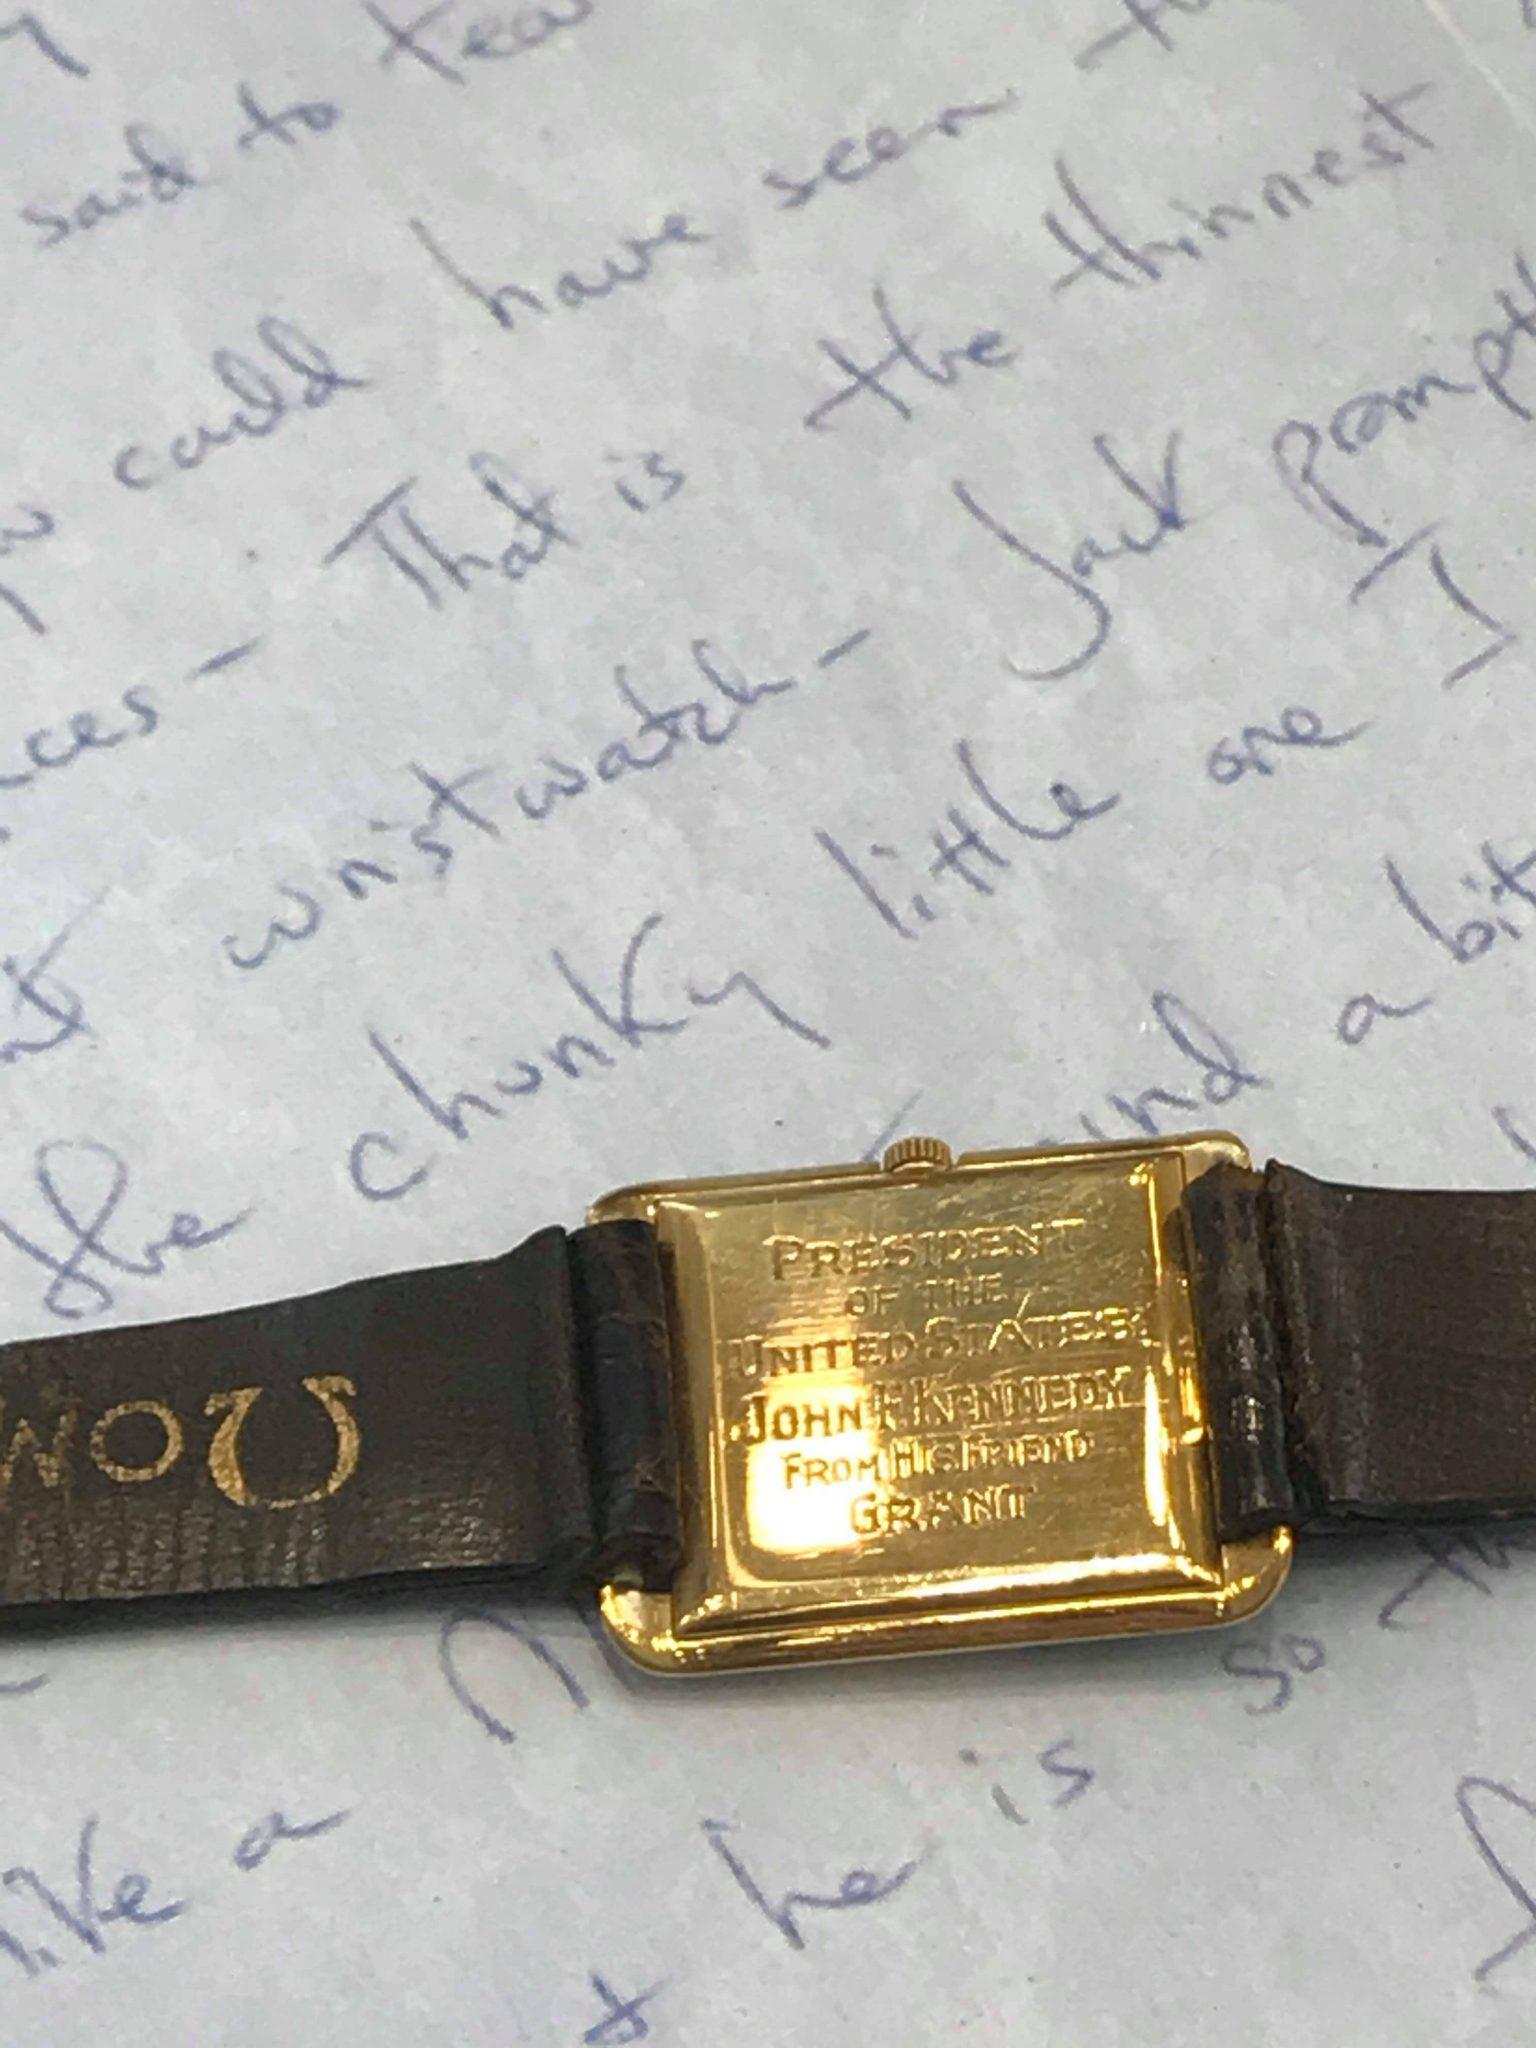 JFK Omega watch, Omega Museum, Biel, Switzerland